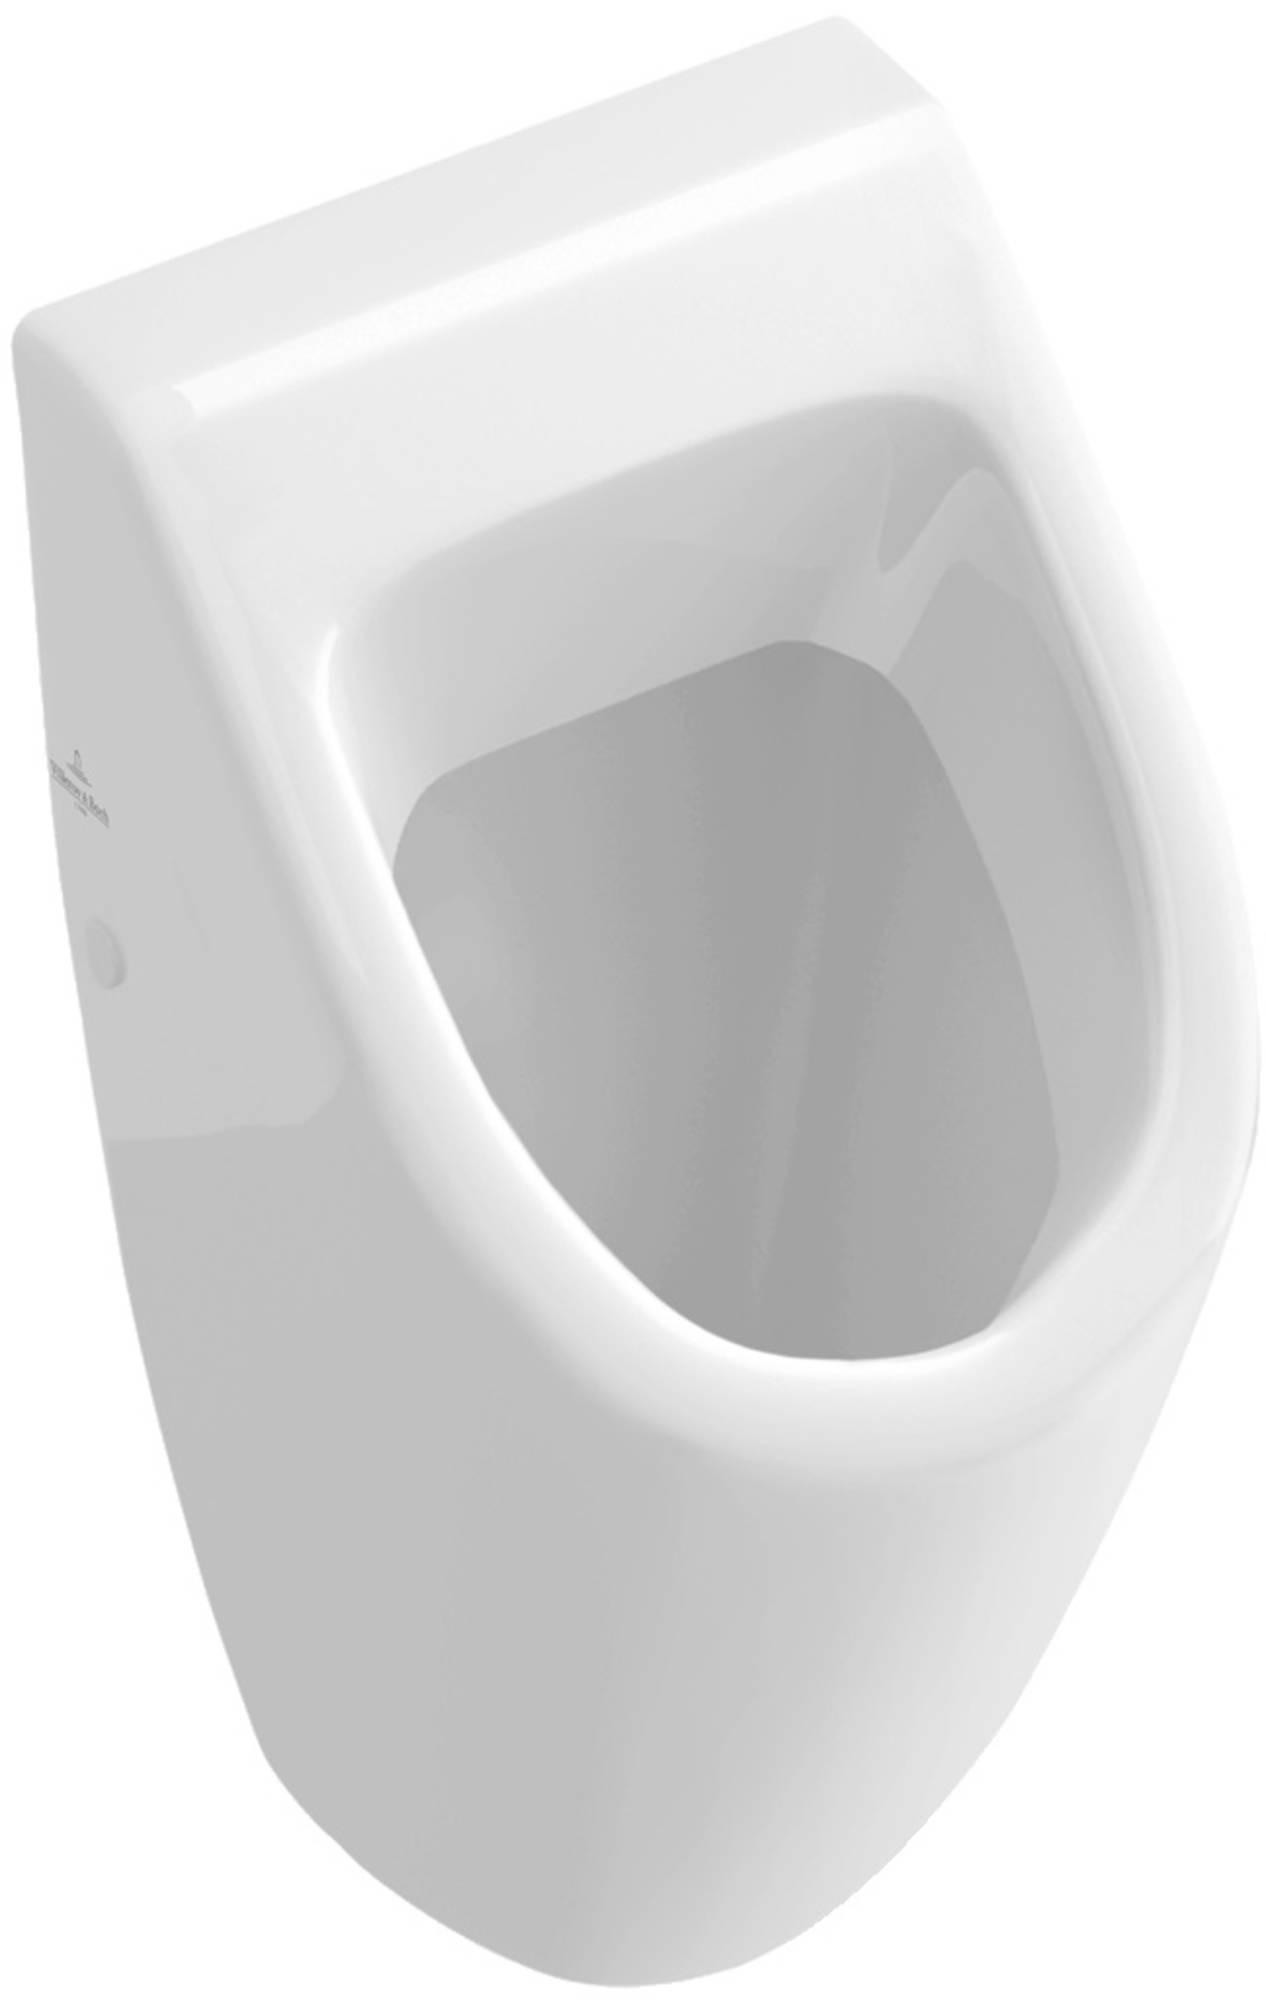 Villeroy & Boch Subway Urinoir 28,5x31,5x53,5 cm Stone White Ceramic+